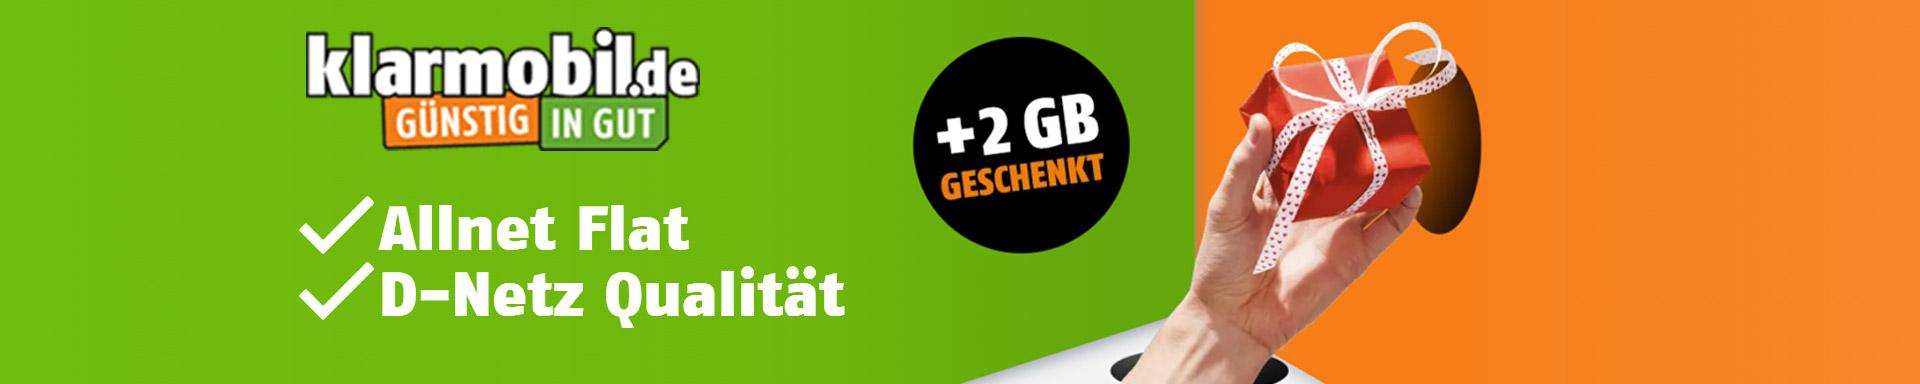 Klarmobil Allnet Flats: 2 GB Datenvolumen geschenkt